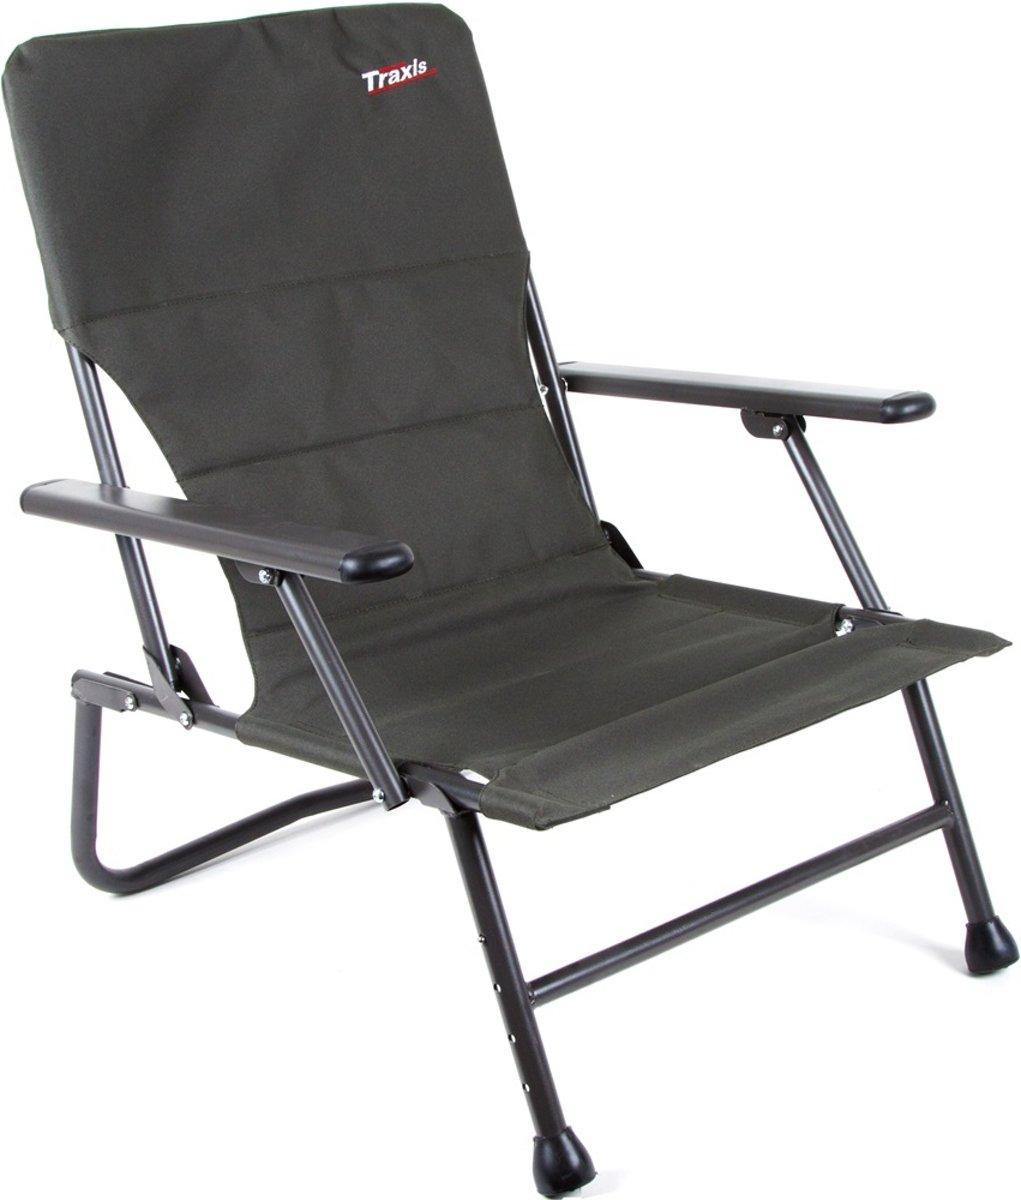 Traxis Basic Chair With Armrest | Stoel